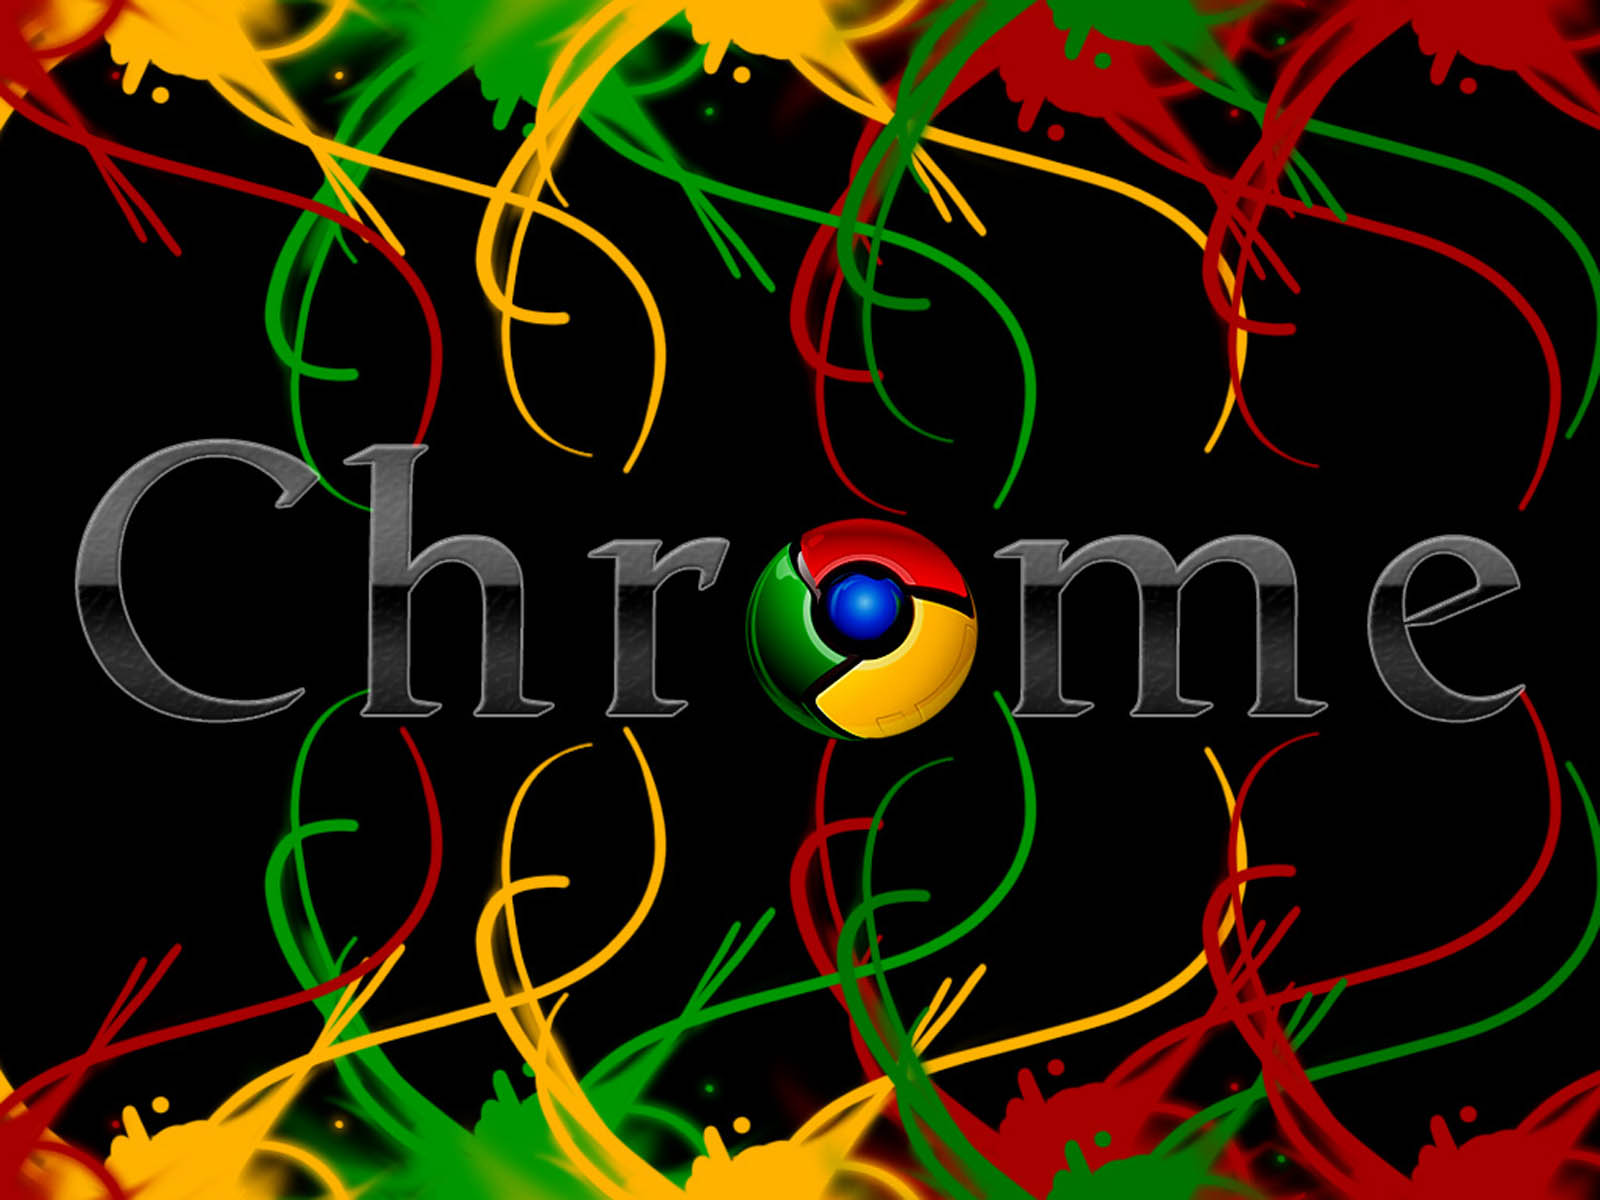 49+] Google Chrome Wallpaper Themes on WallpaperSafari